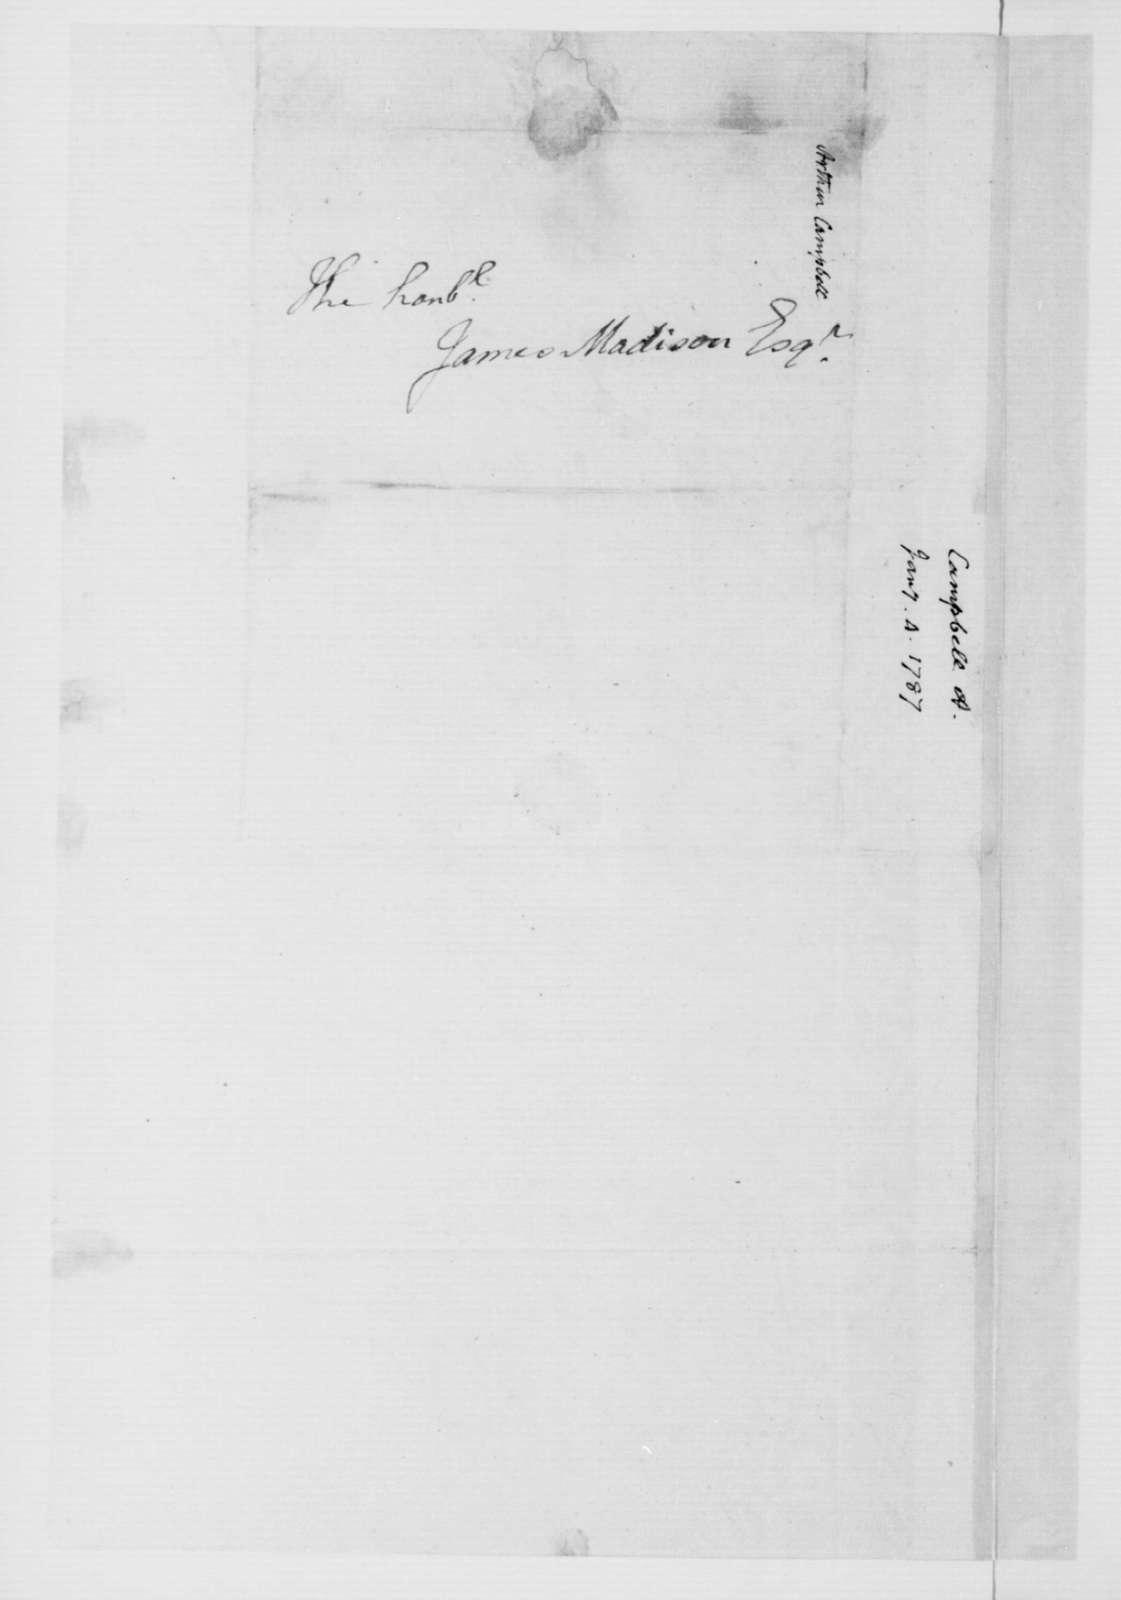 Arthur Campbell to James Madison, January 4, 1787.